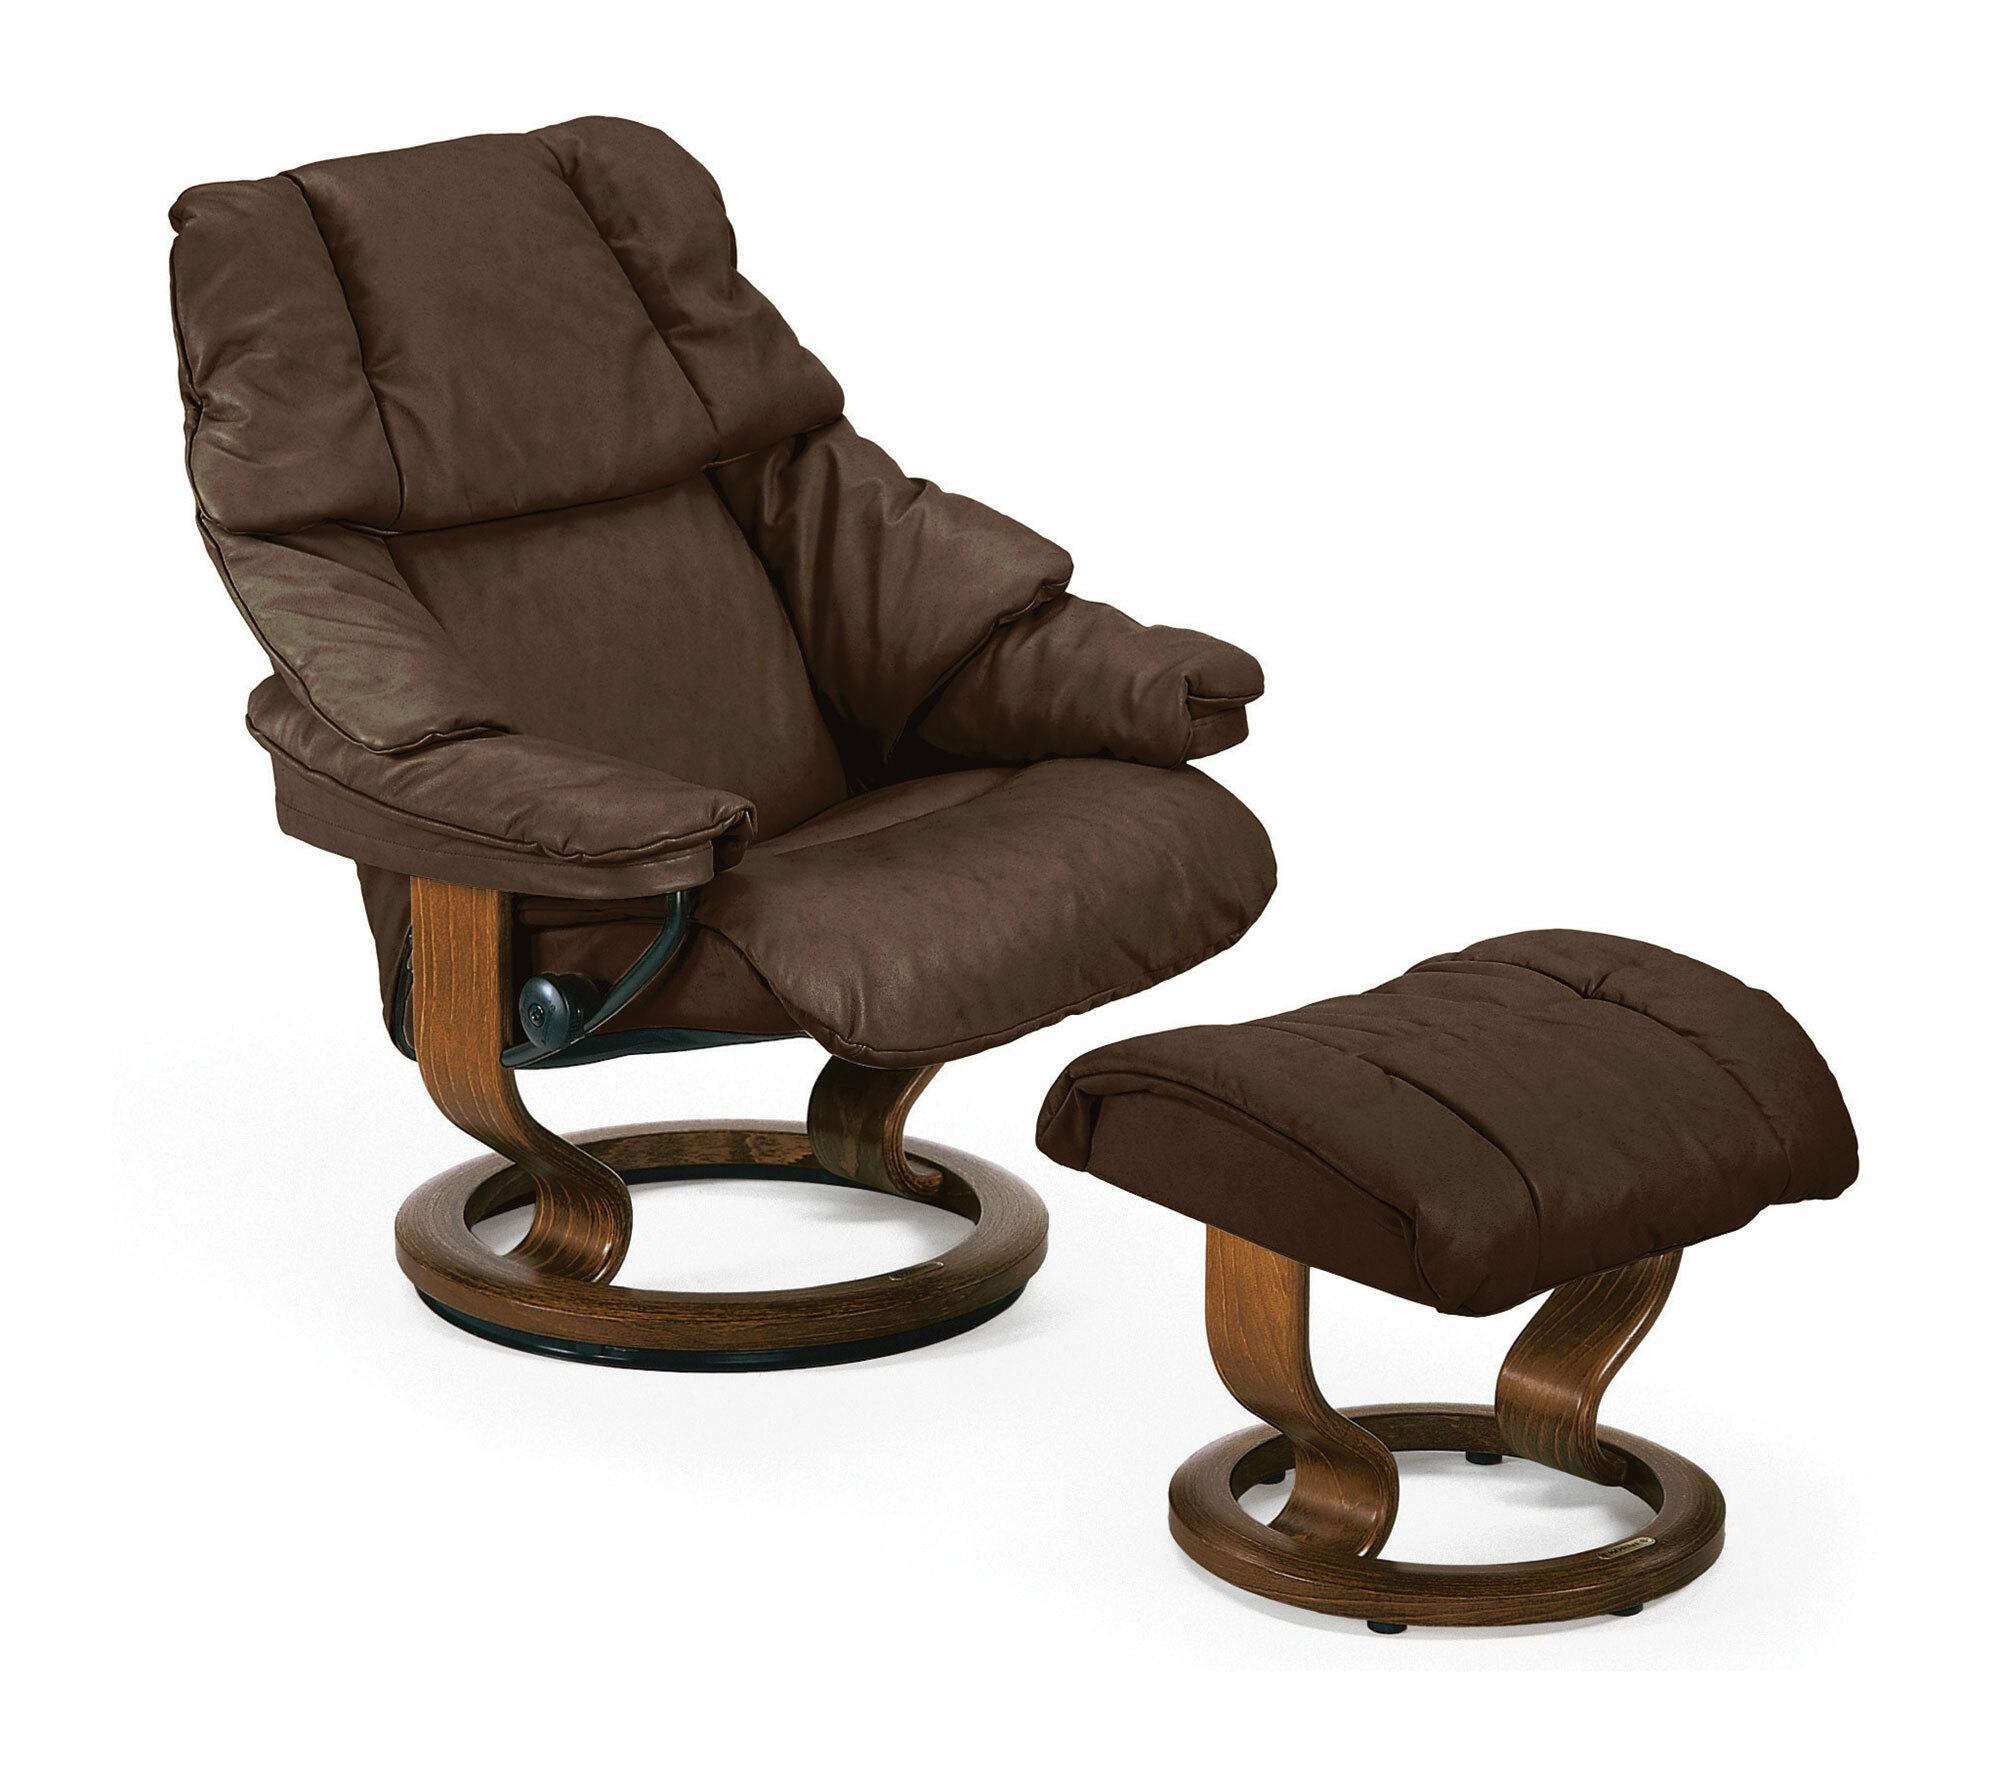 stressless reno m tv tuoli lepotuolit tuotteet maskun kalustetalo. Black Bedroom Furniture Sets. Home Design Ideas